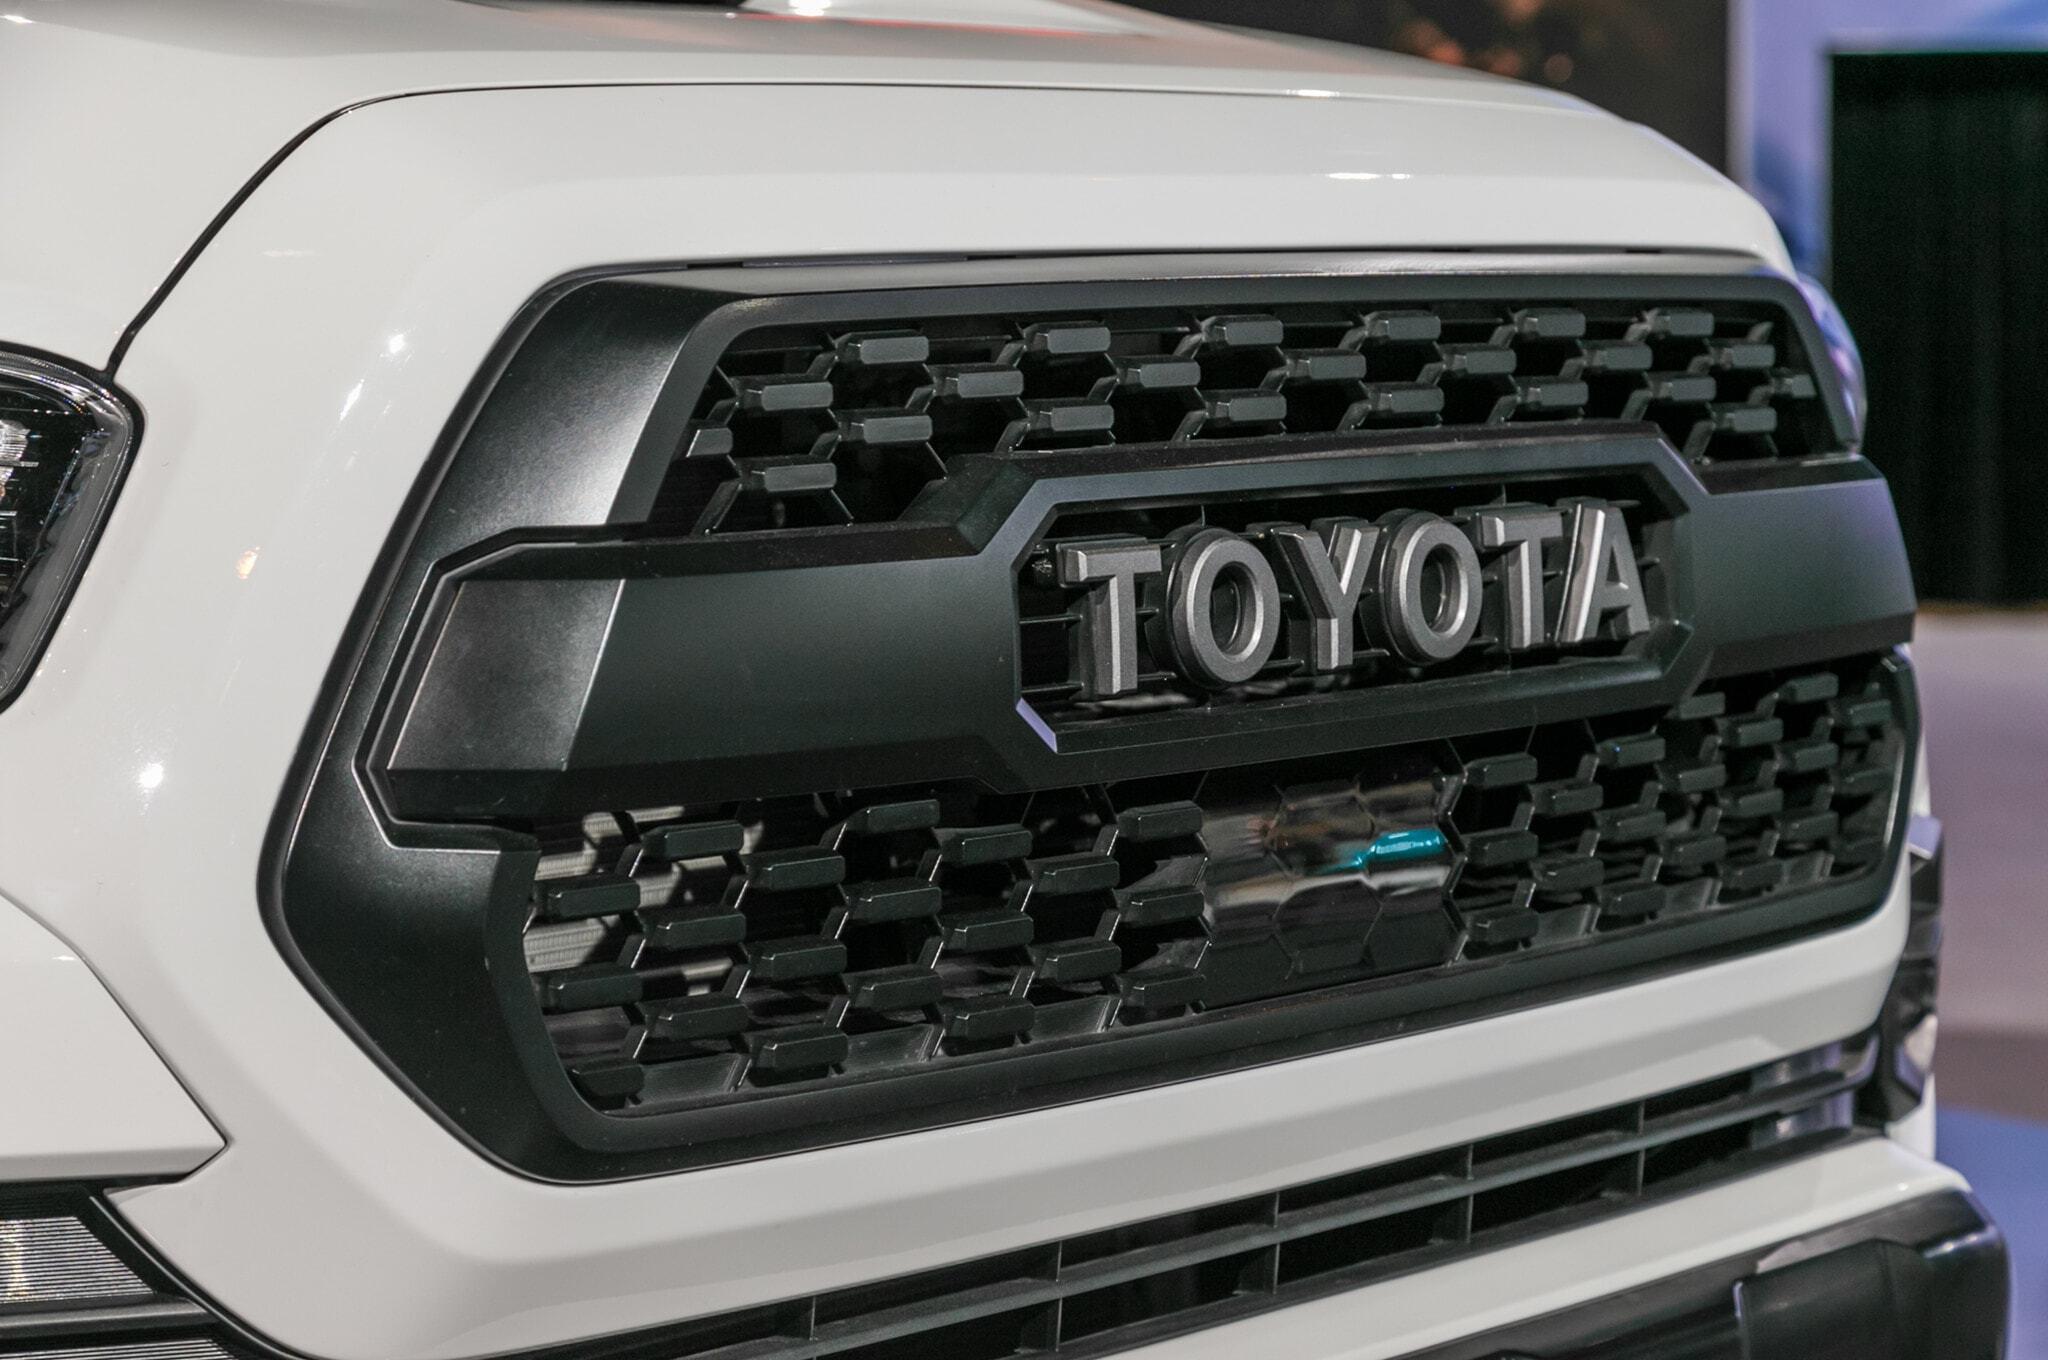 2019-Toyota-Tacoma-TRD-Pro-grille